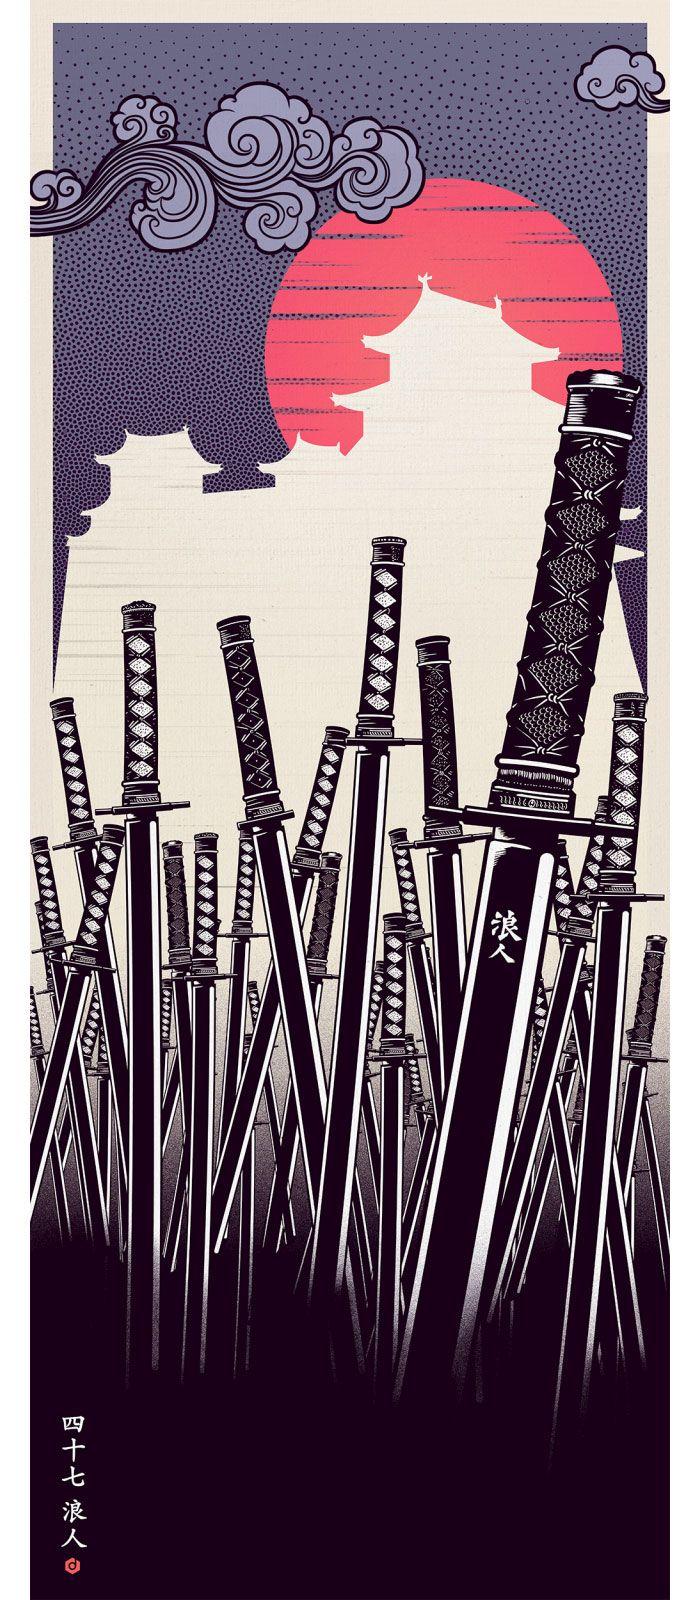 47 Ronin - Alternative Movie Poster